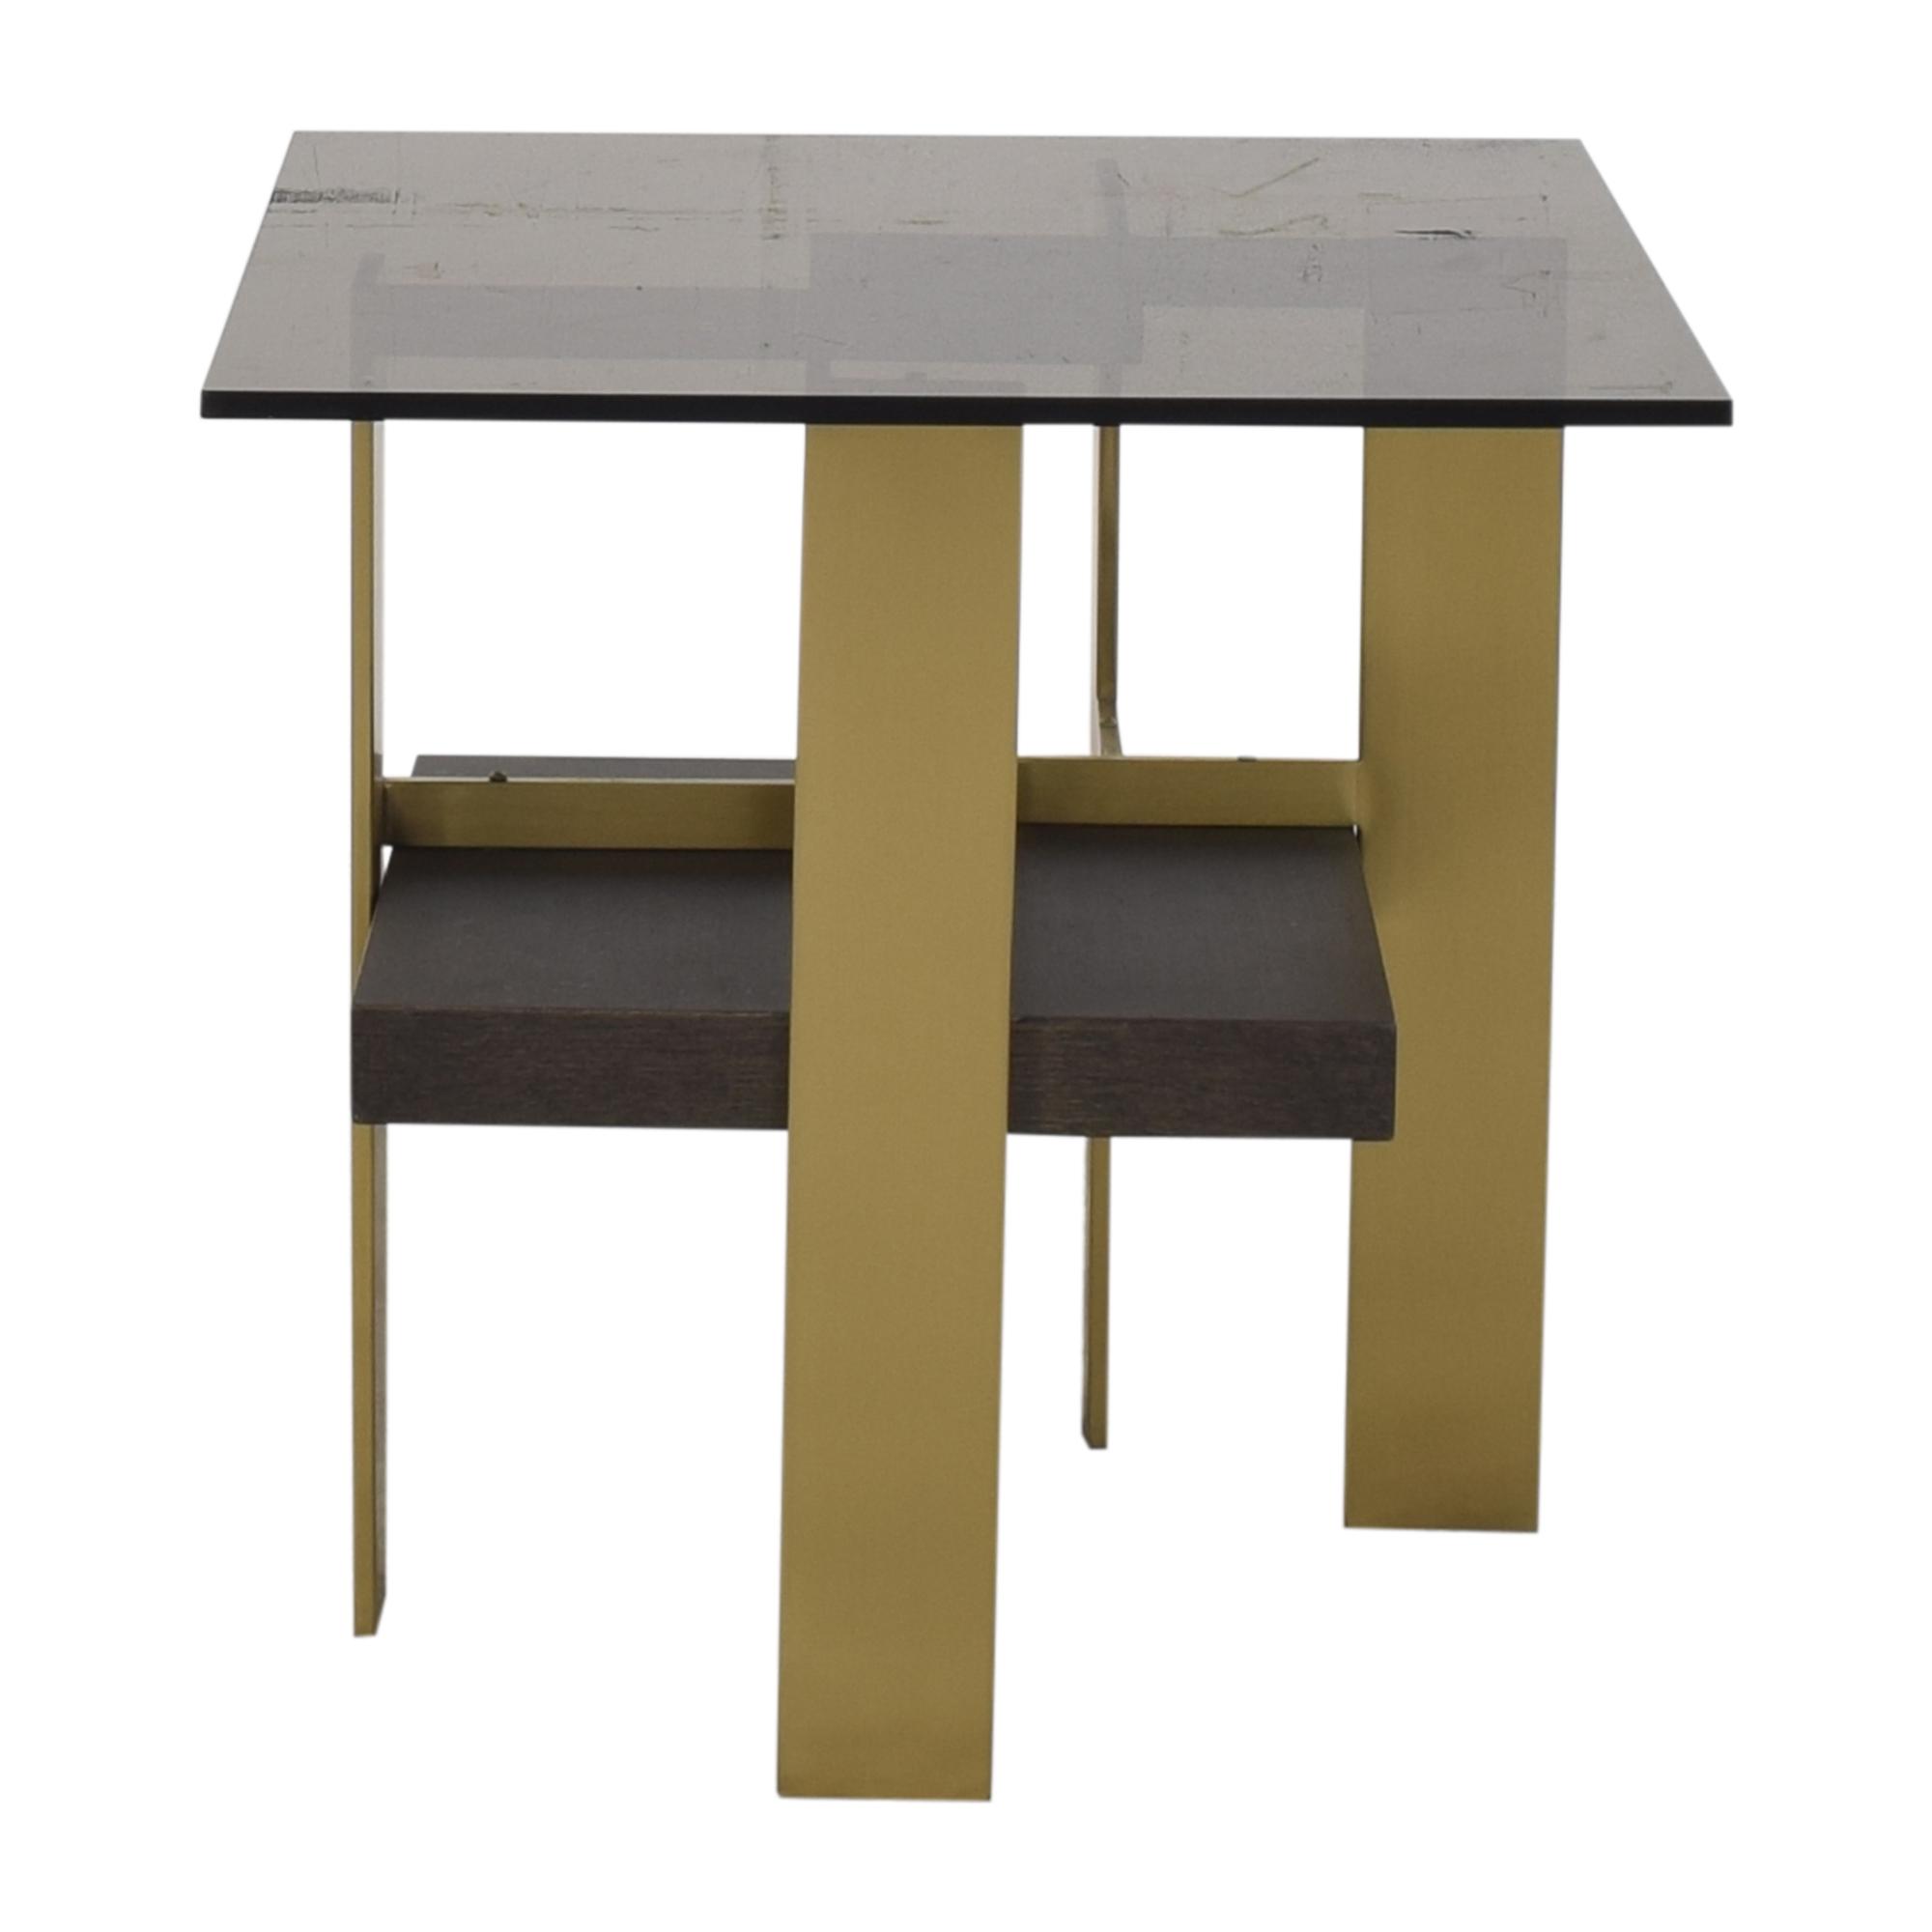 Huffman Koos Huffman Koos Geometric Side Table End Tables